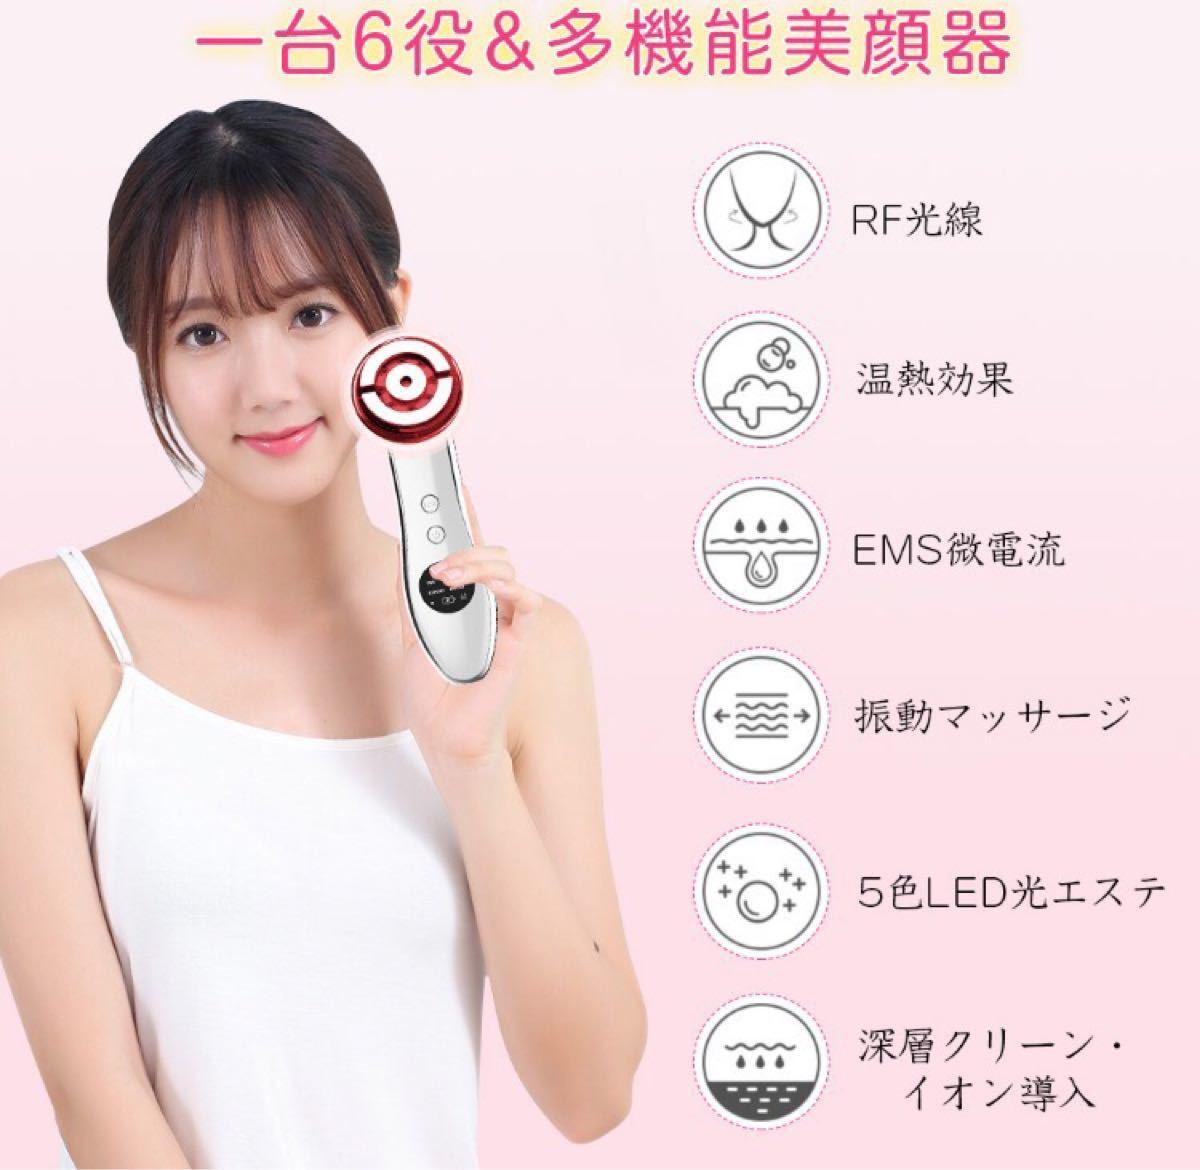 超音波美顔器 RF美顔器 LED美顔器 1台5役 光エステ美顔